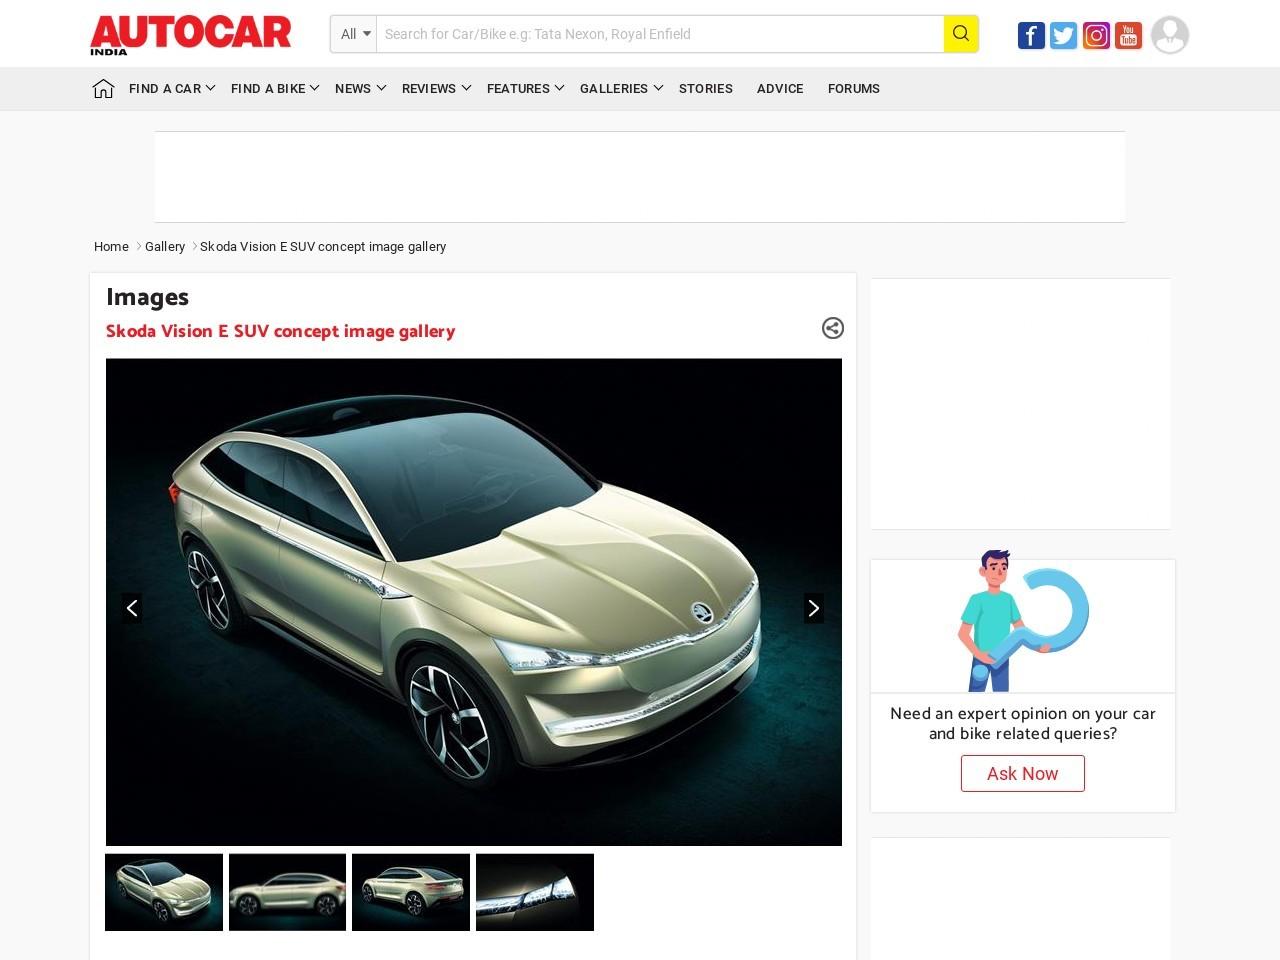 PhotoGallery: Skoda Vision E SUV concept image gallery